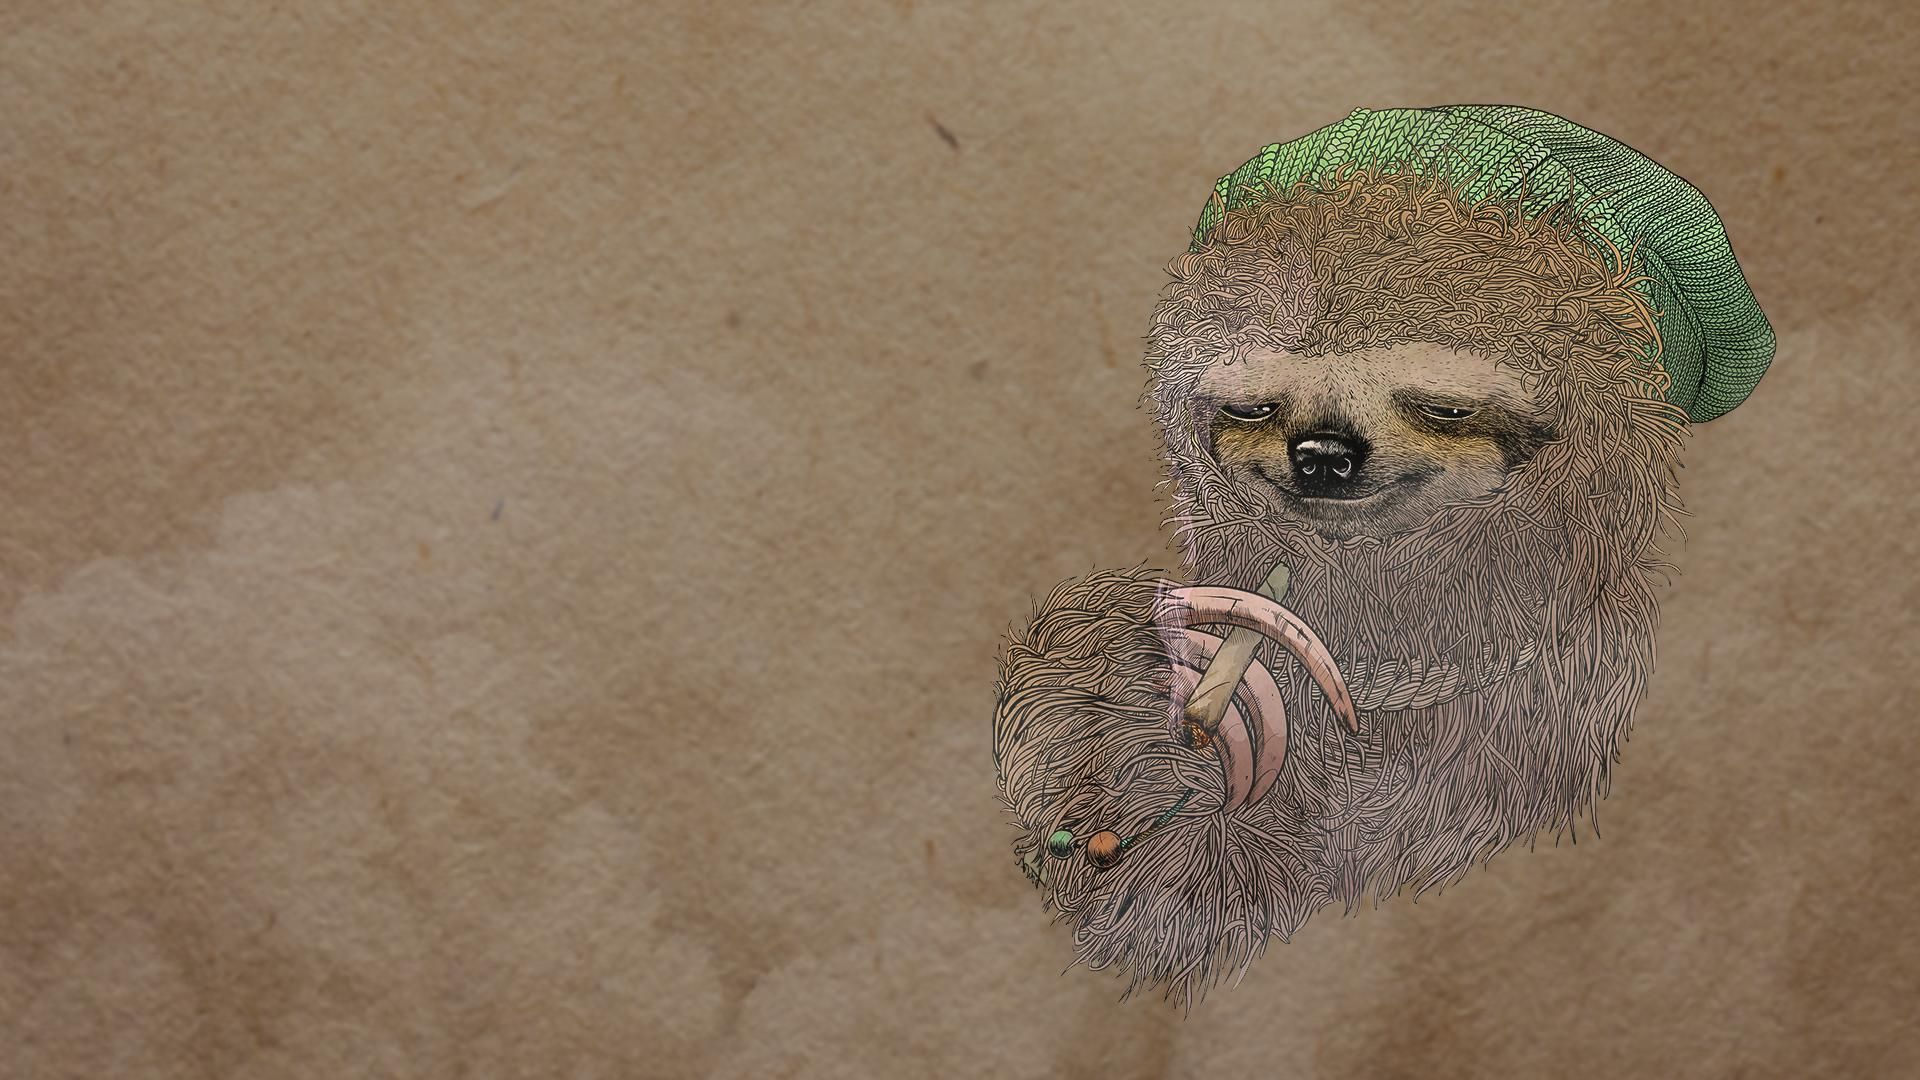 Sloth full hd 1080p wallpaper